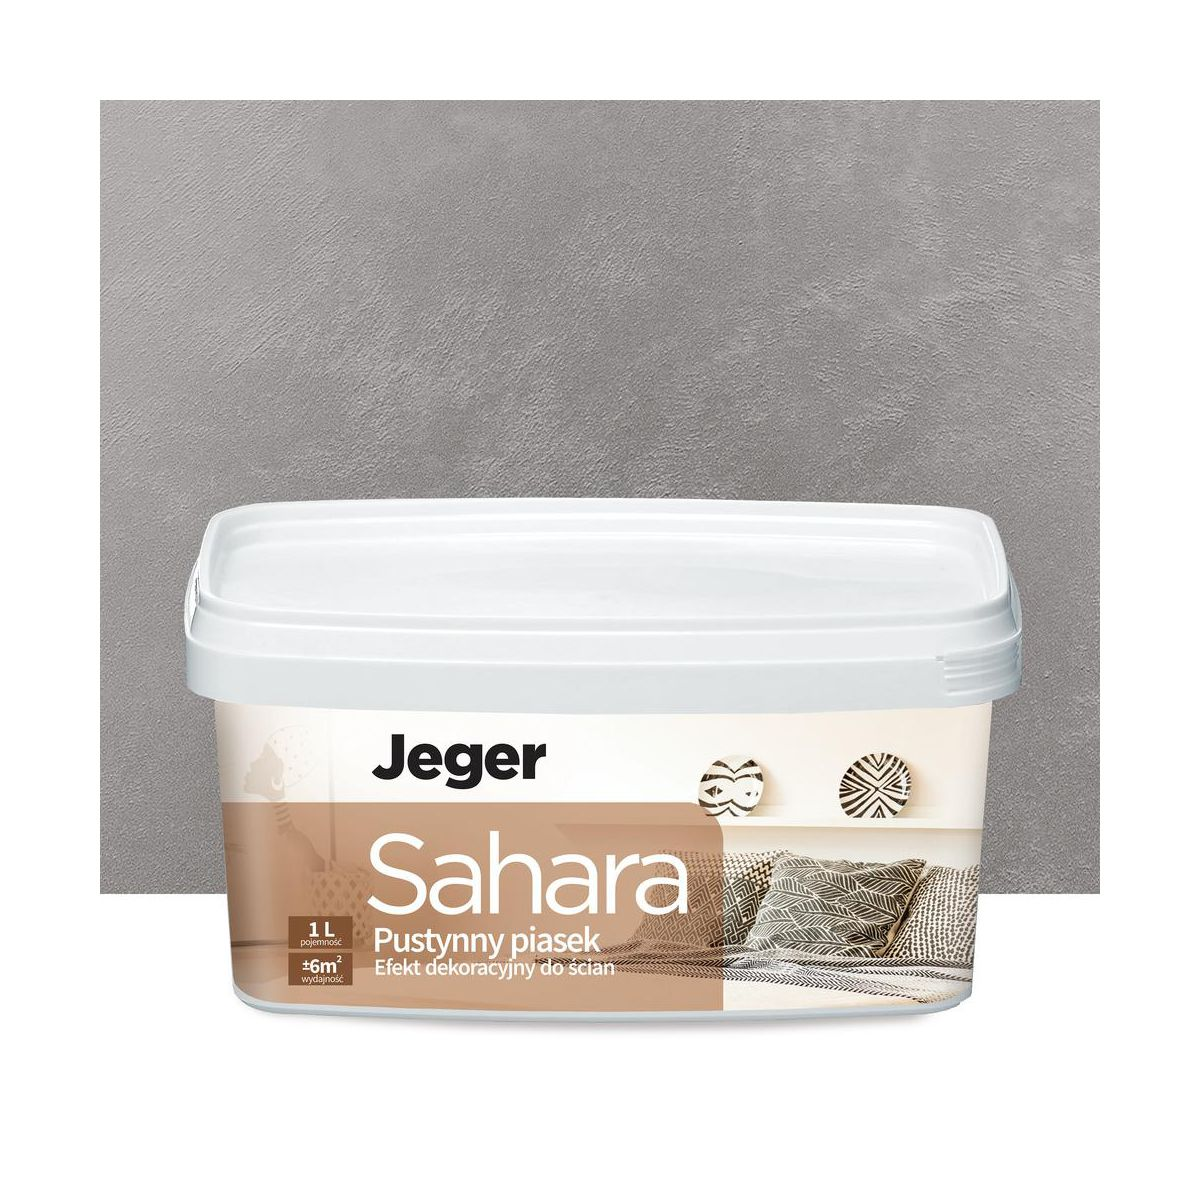 Farba Dekoracyjna Sahara Pietro Piaskowany Jeger